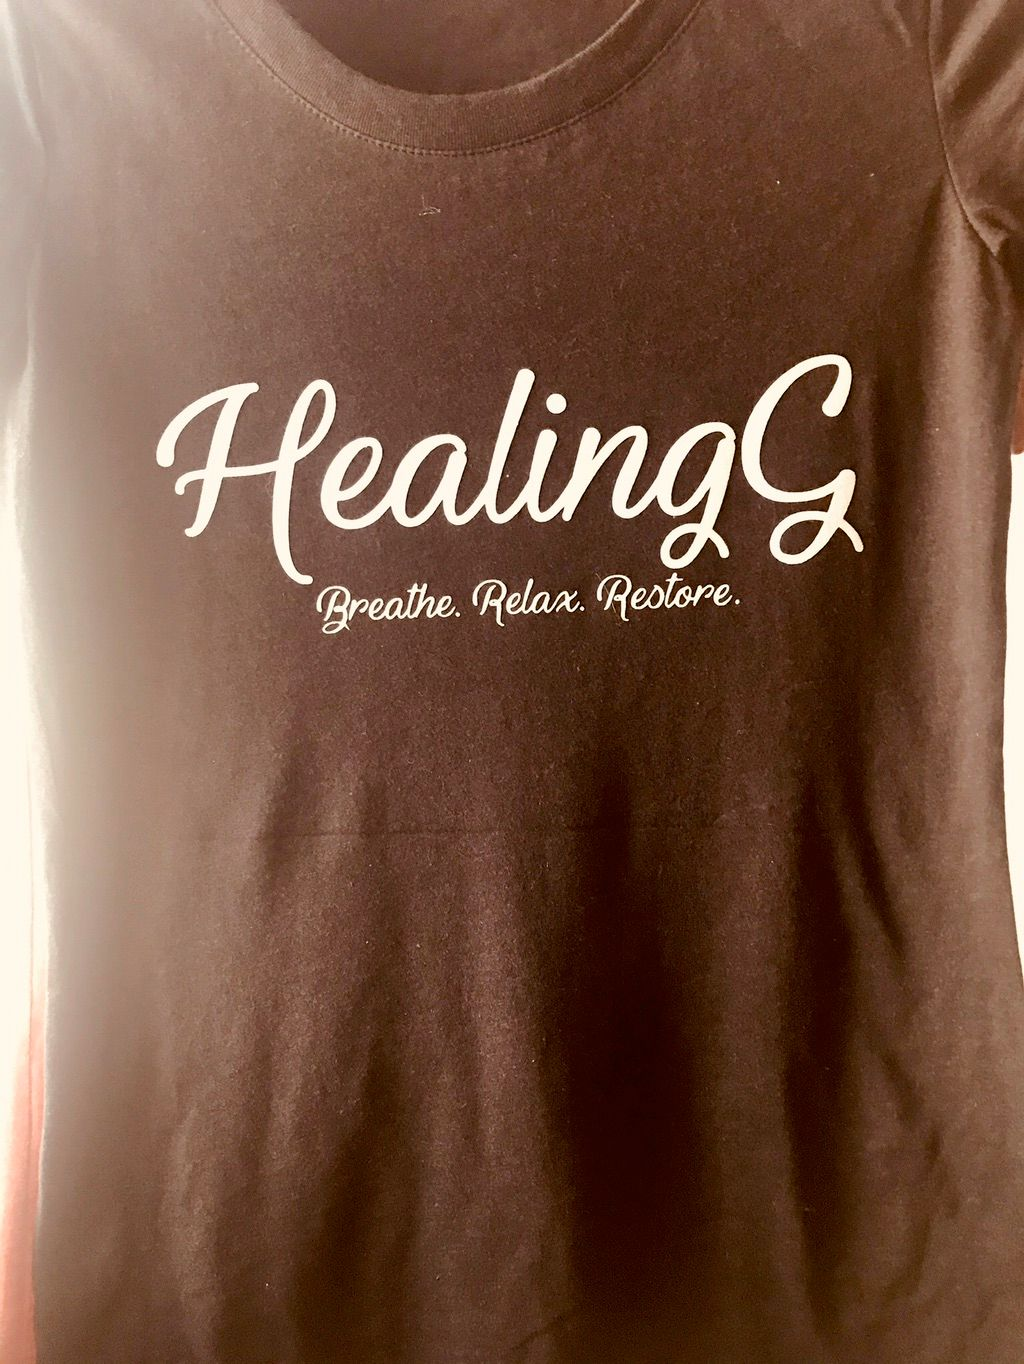 Healing G